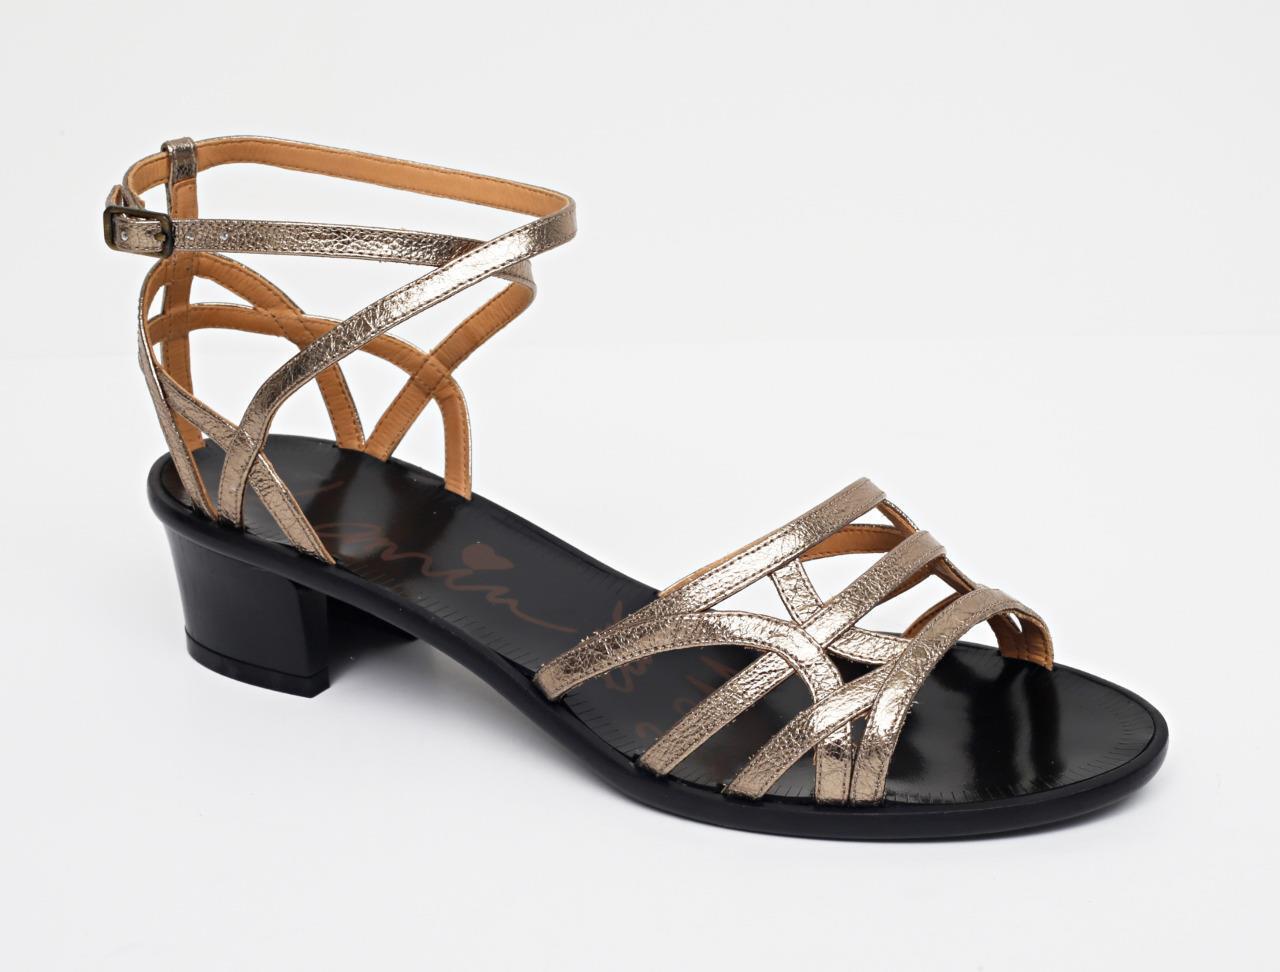 LANVIN damen Gold Strappy Ankle-Strap Mid-Heel Sandal Pump 9.5-39.5 NEW+BOX